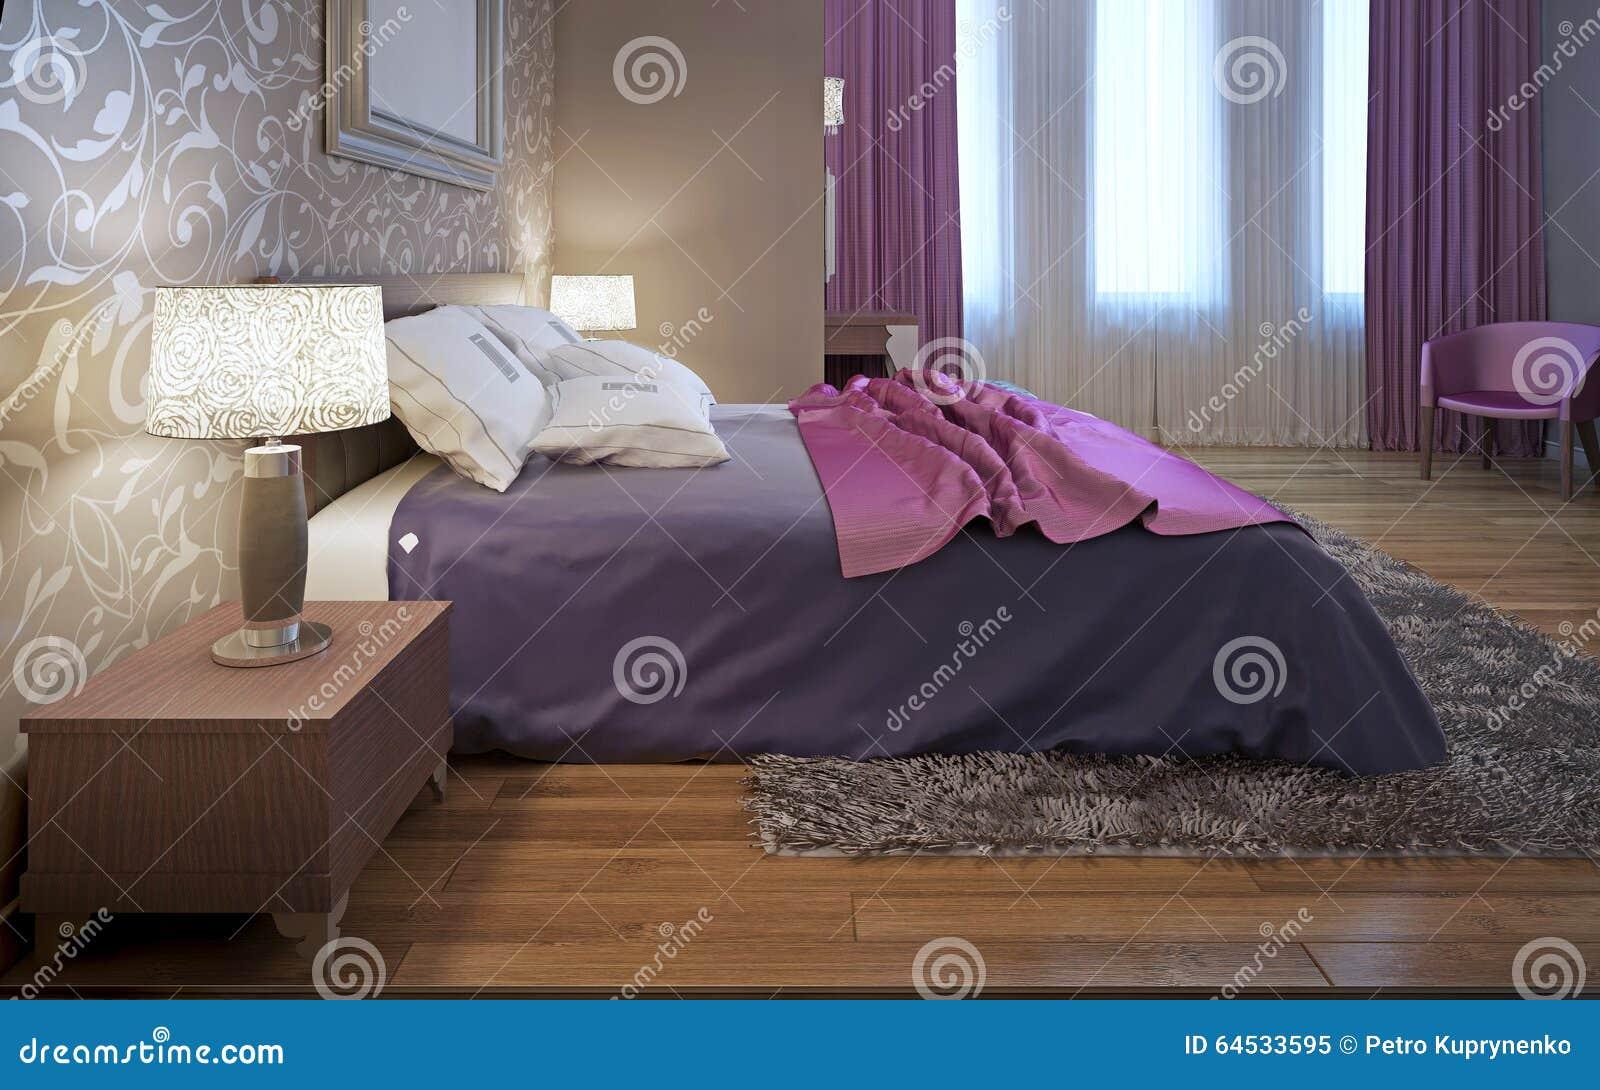 Master bedroom in avantgarde style stock photo image 64533595 - Bedroom interior pink purple ...